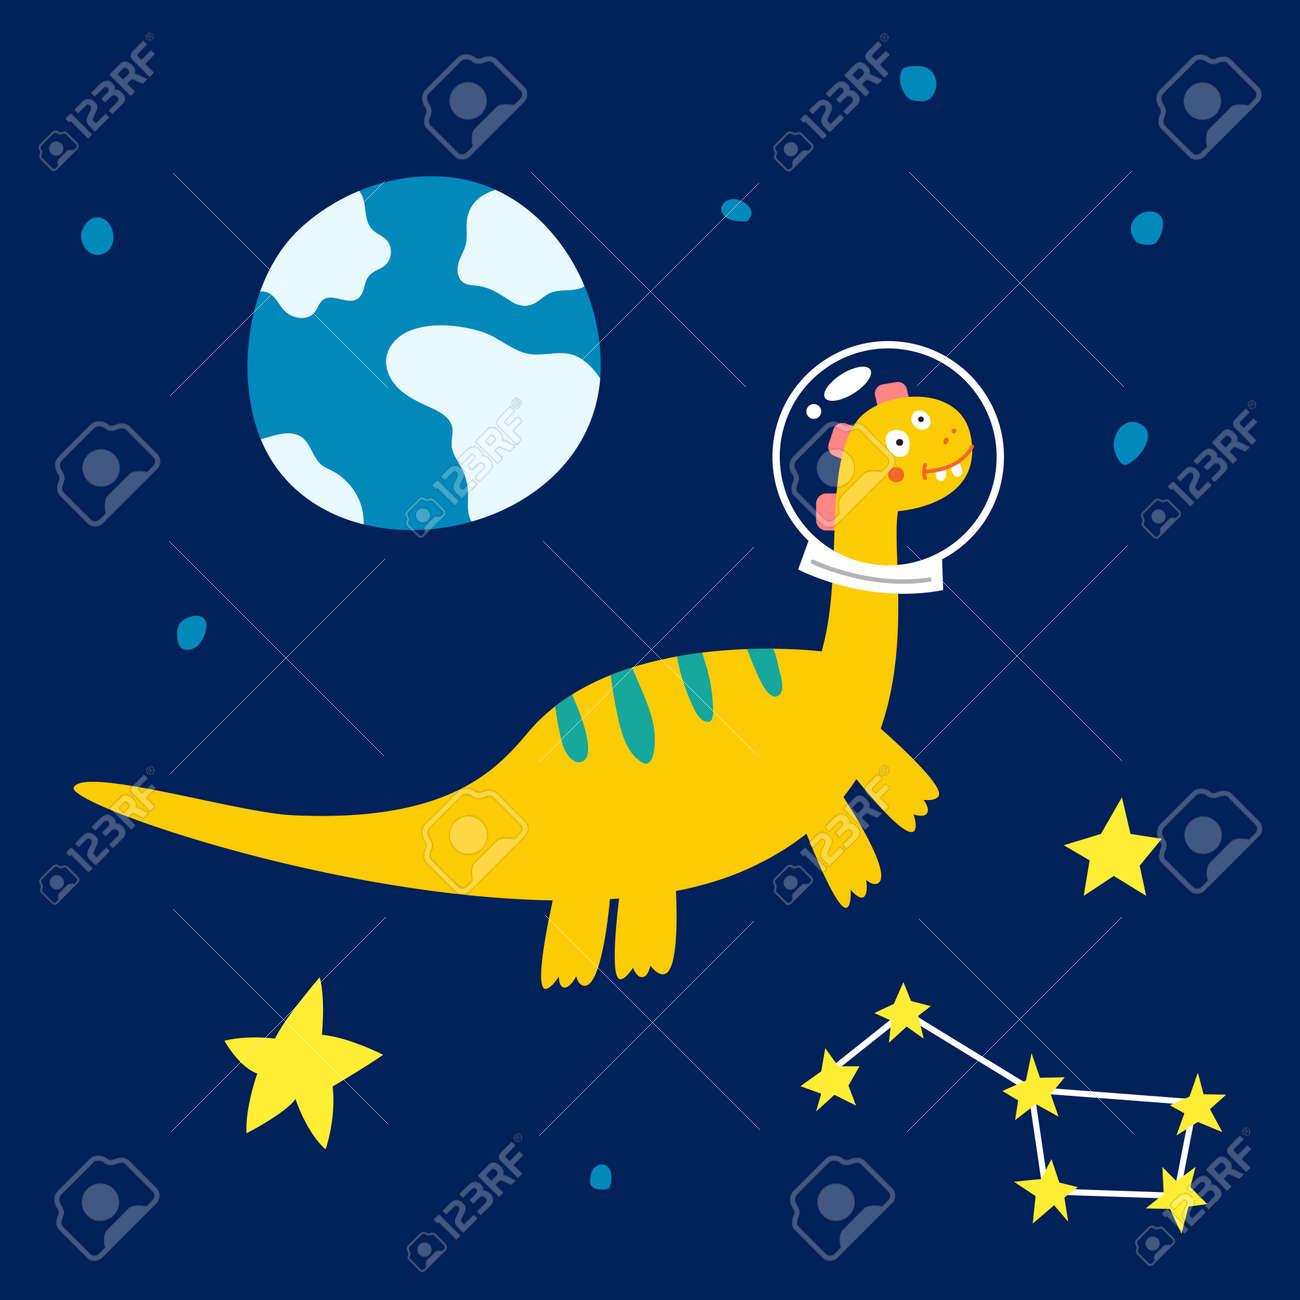 Space dinosaur, vector illustration for children fashion. - 169772196